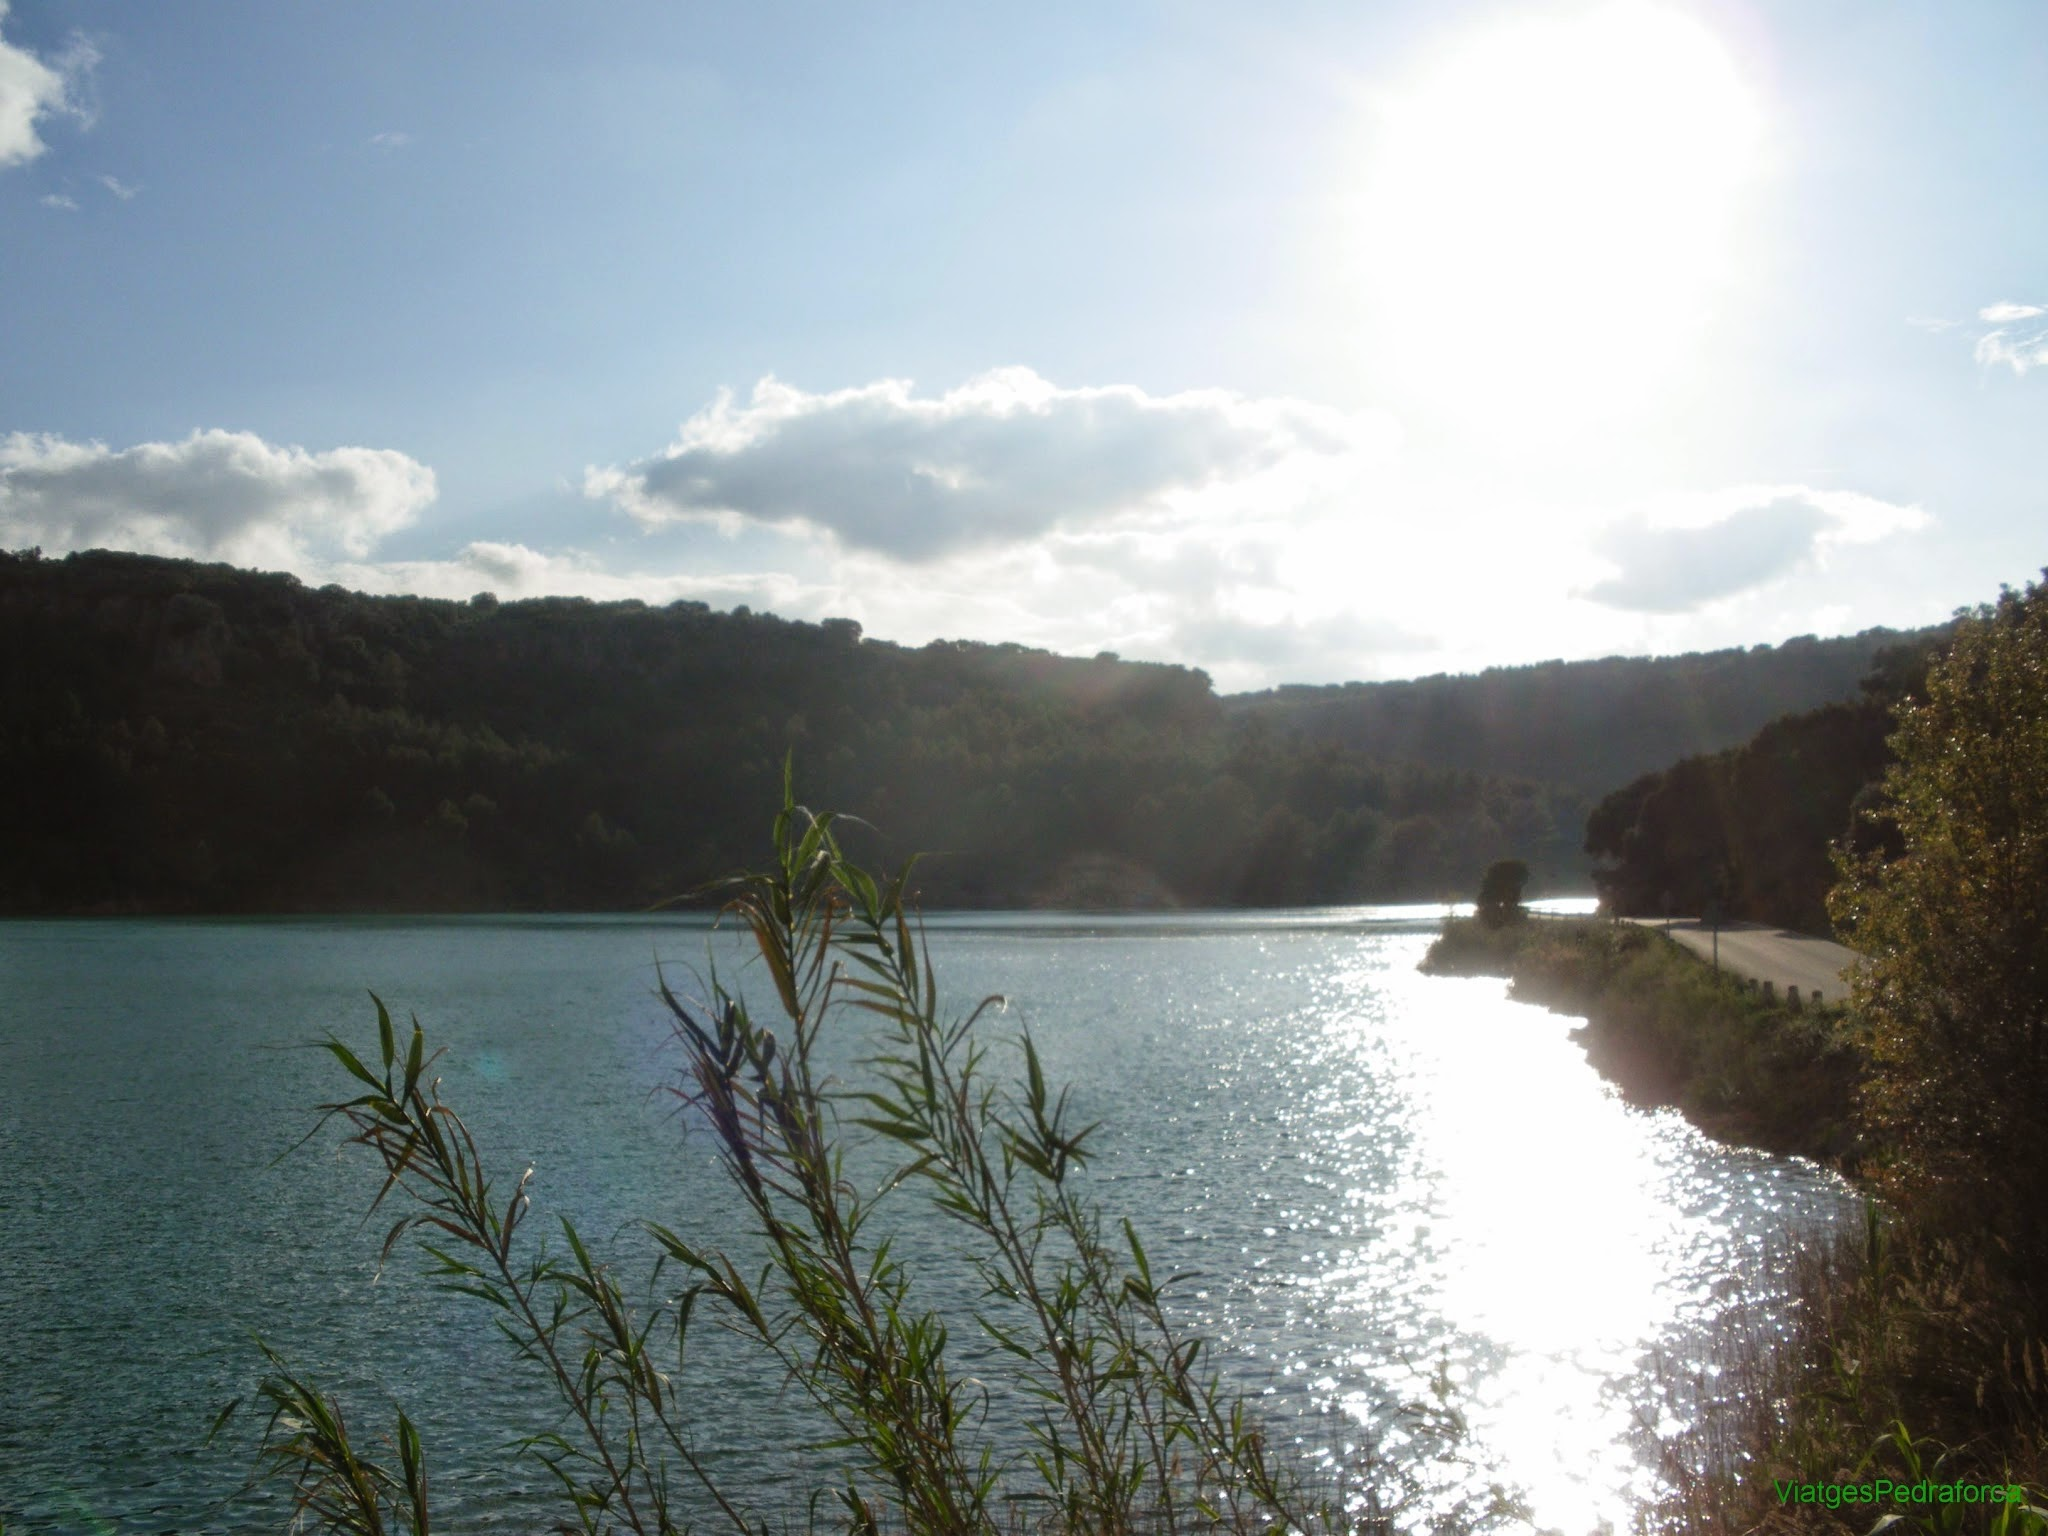 Lagunas de Ruidera, Albacete, Castilla La Mancha